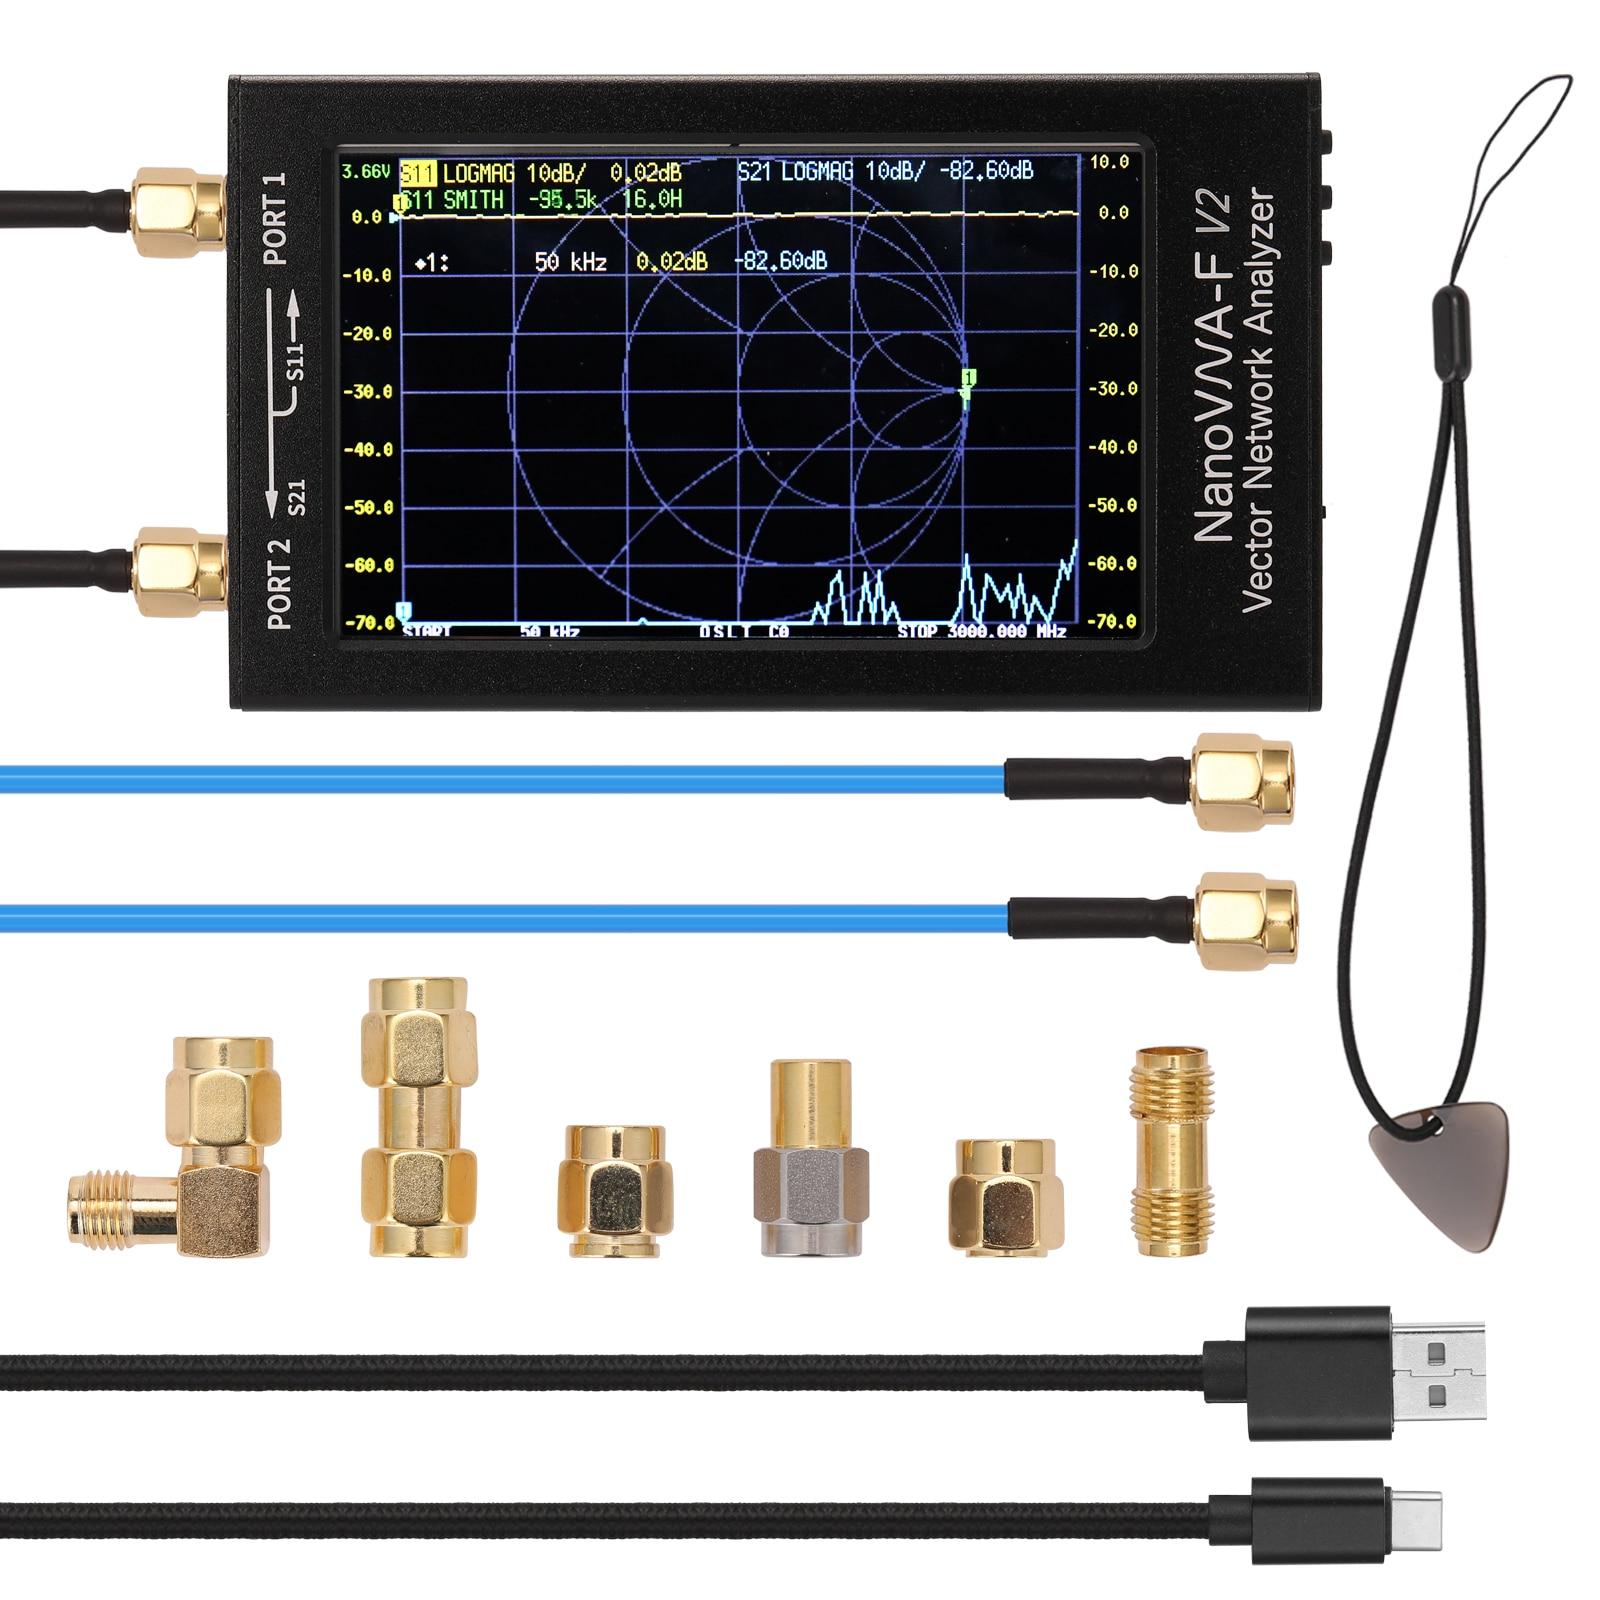 NanoVNA-F V2 ناقلات شبكة محلل 4.3 بوصة IPS شاشة الكريستال السائل الطيف محلل S-A-A-2 هوائي محلل موجة قصيرة HF VHF UHF